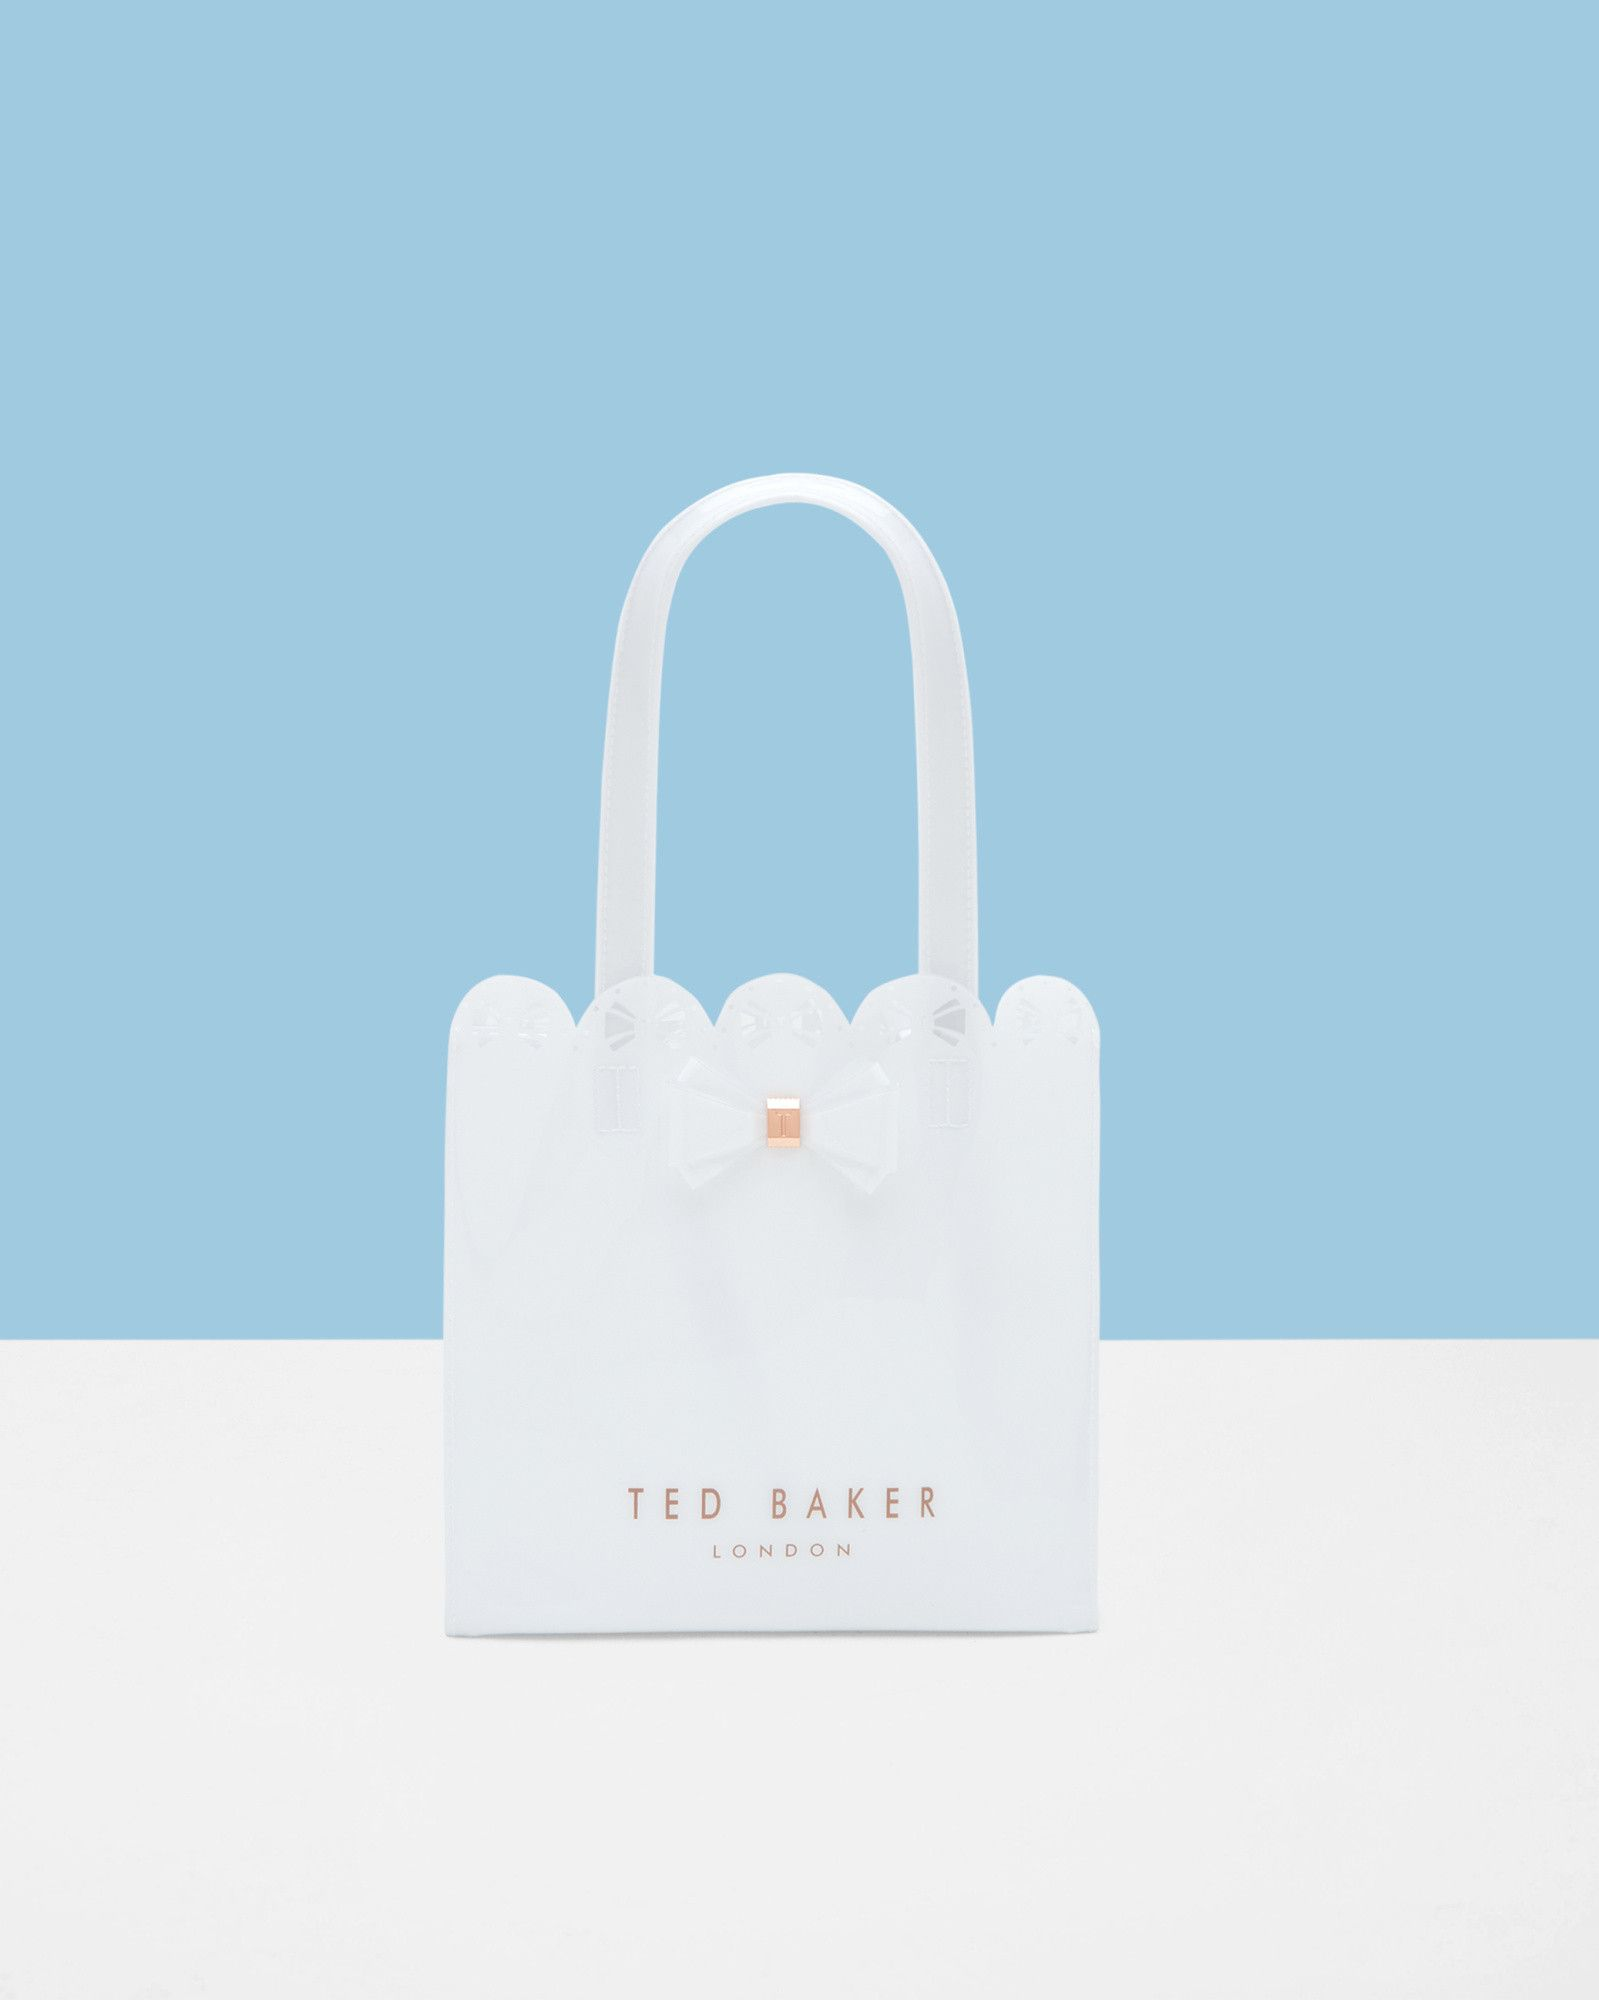 e8825ed14b909 ... Scallop edge small bow shopper bag - White Bags Other Europe Site  arrives c930f 371e5 ... TED BAKER ...